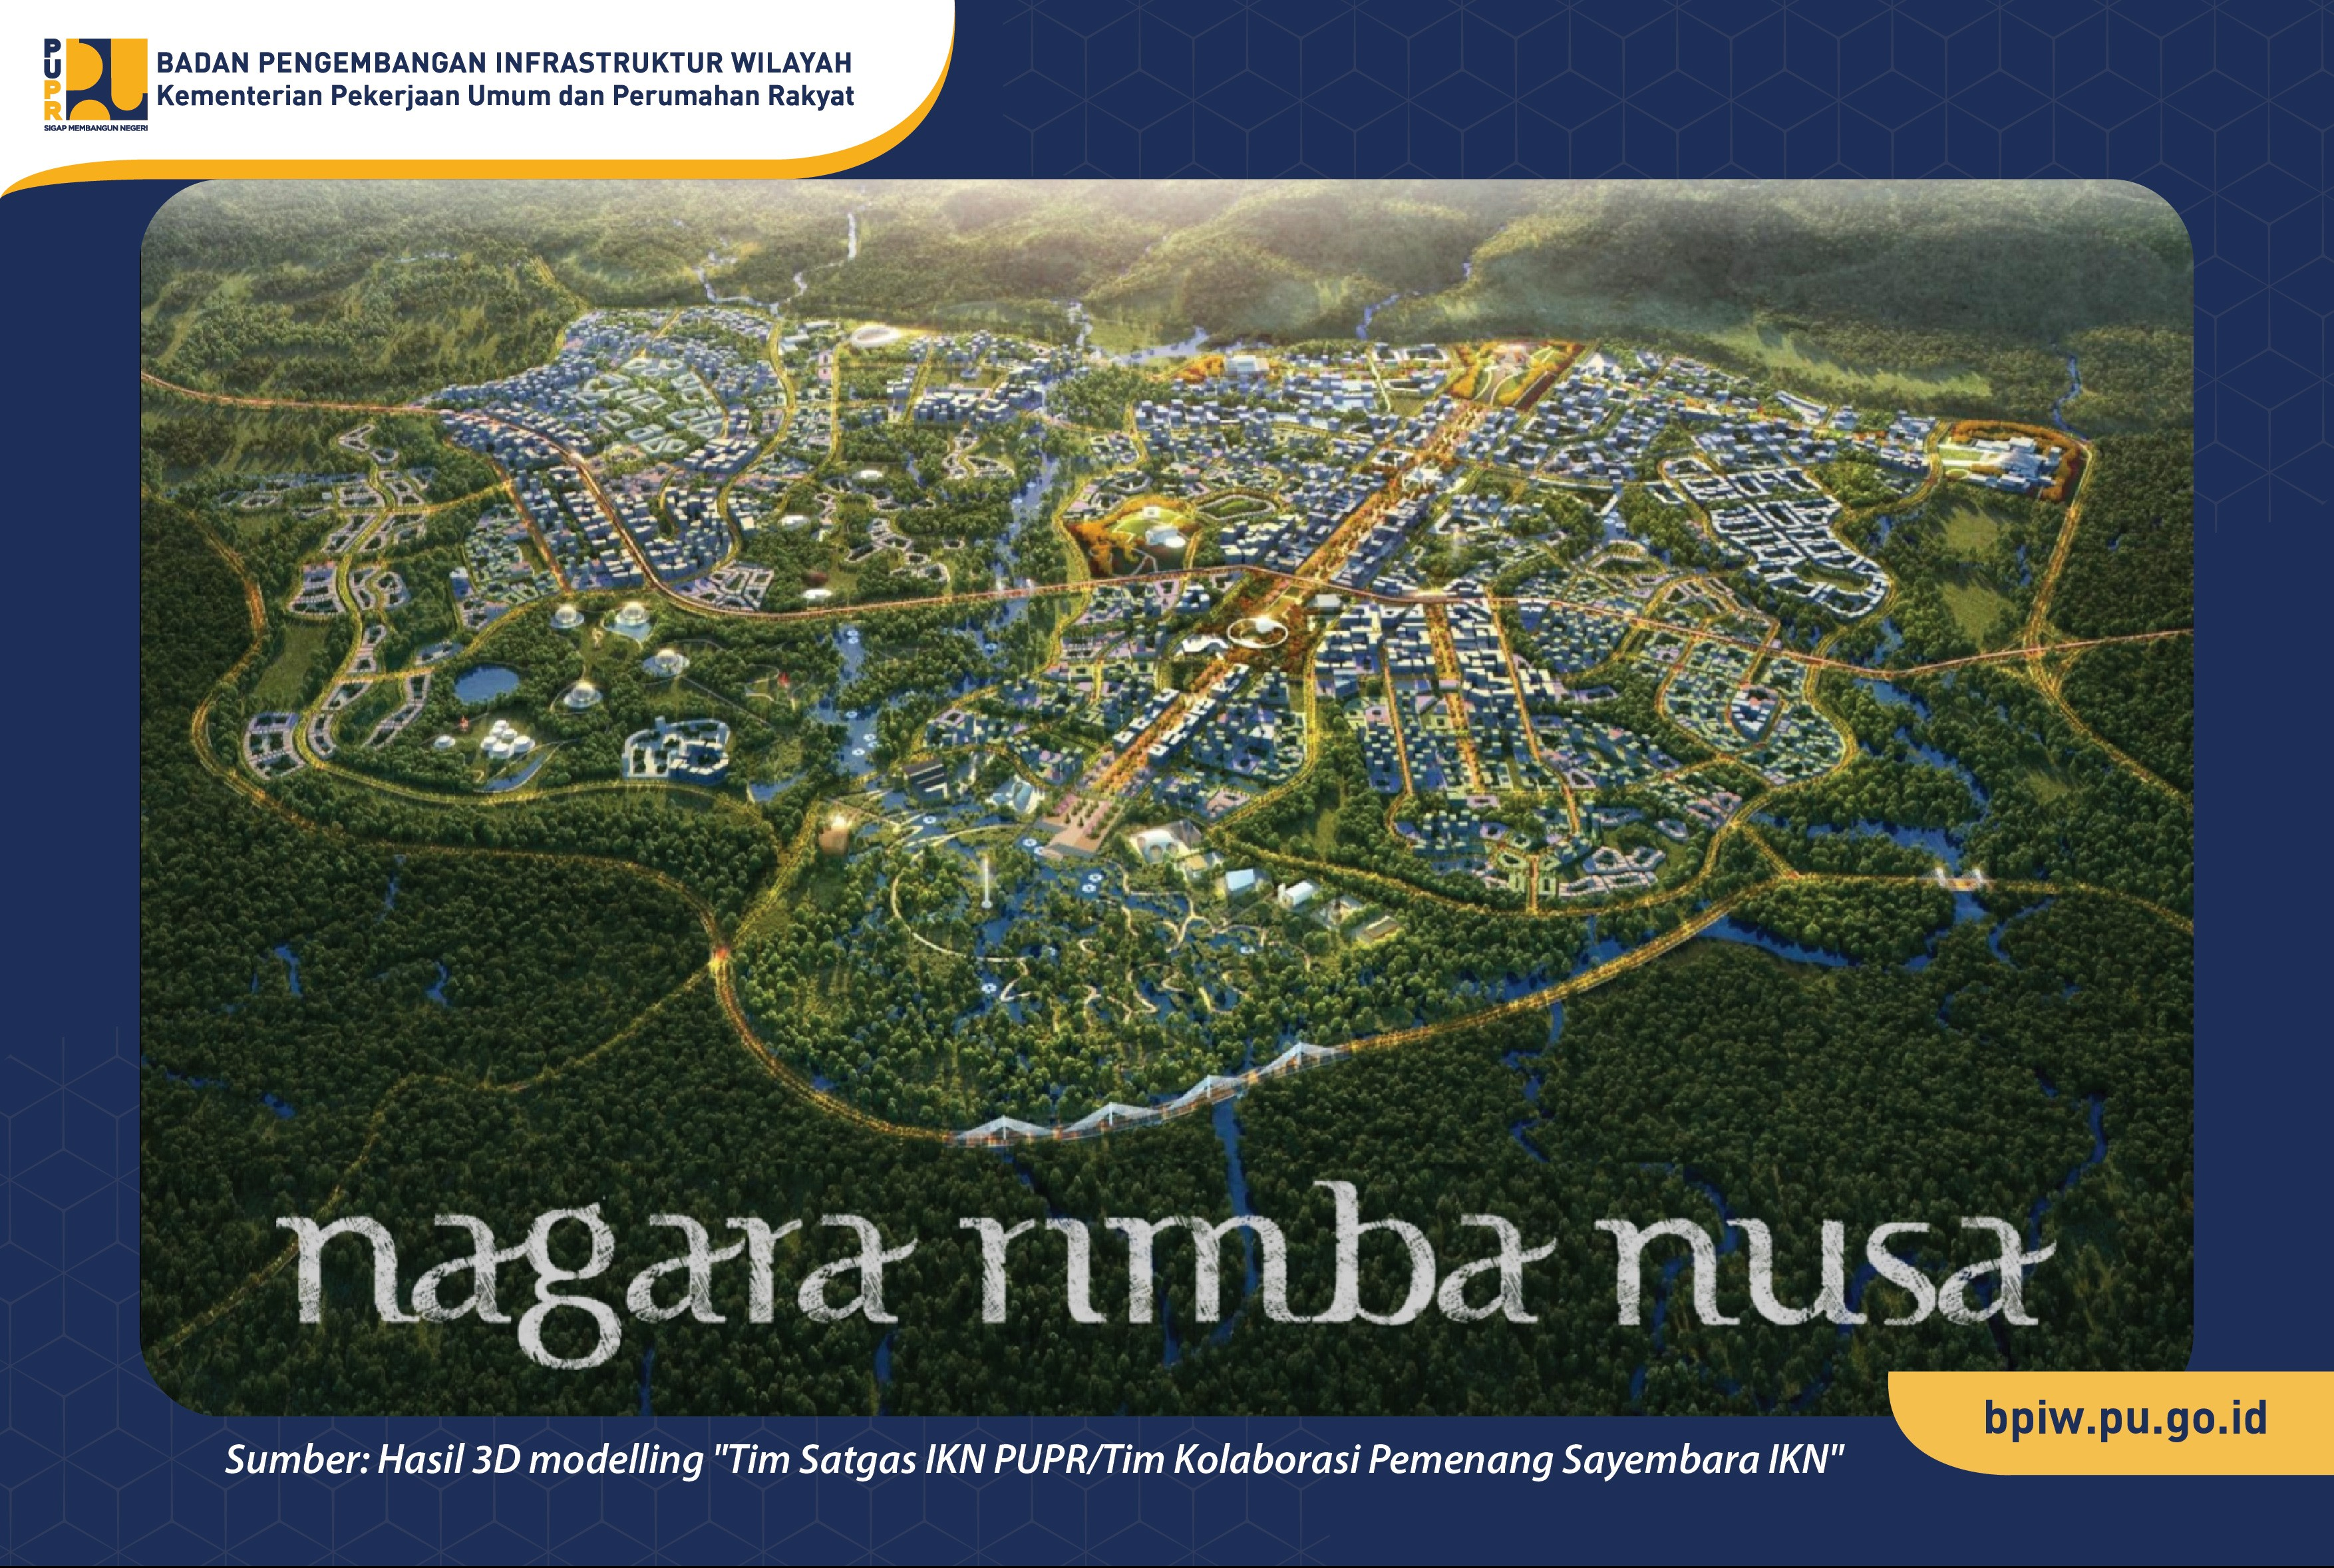 BPIW Ajukan Usulan Program Pembangunan Infrastruktur PUPR di Ibu Kota Negara